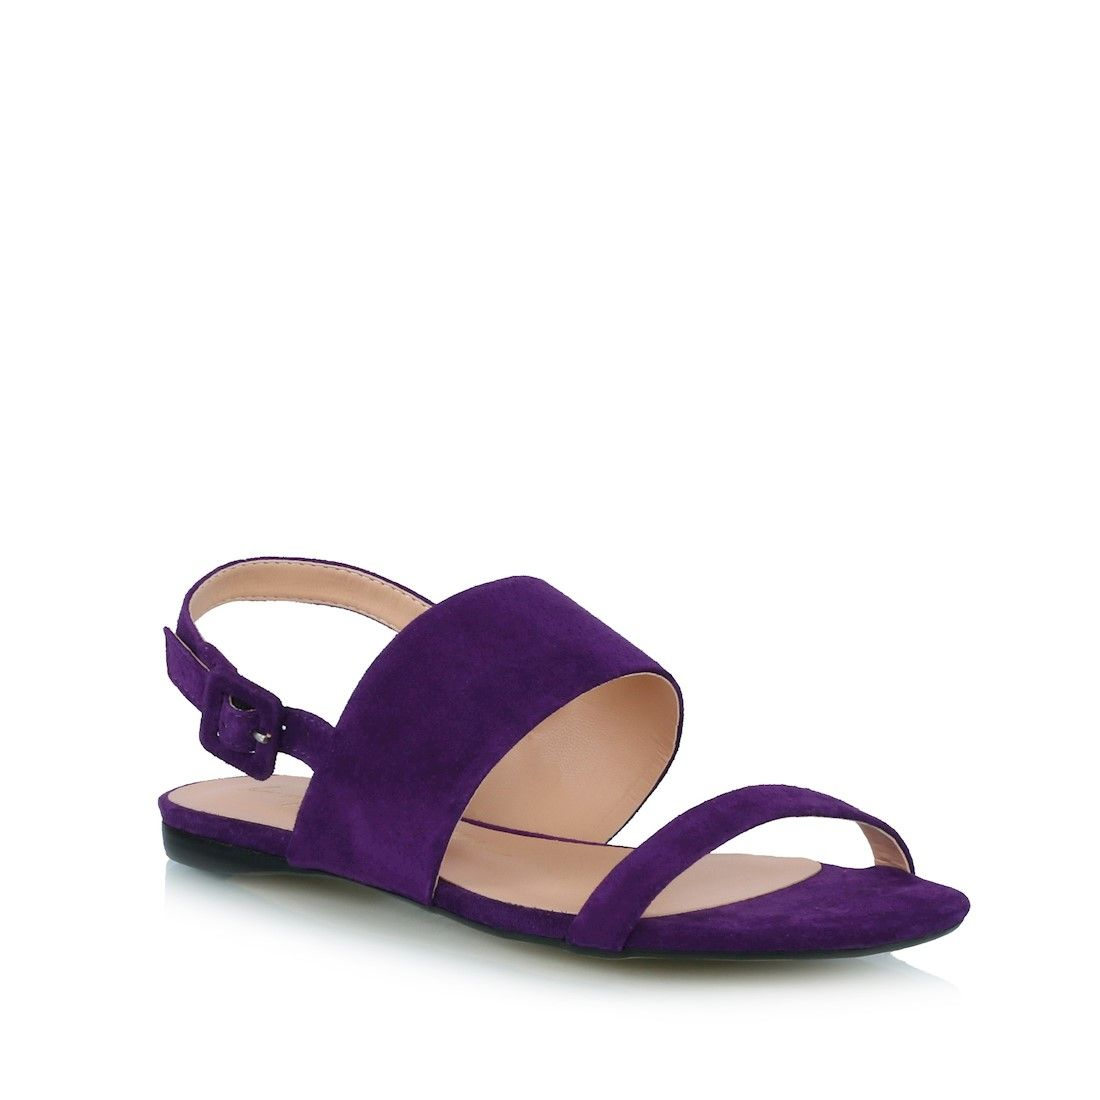 Sapatos Femininos 2019 na Luiza Barcelos   Sandálias